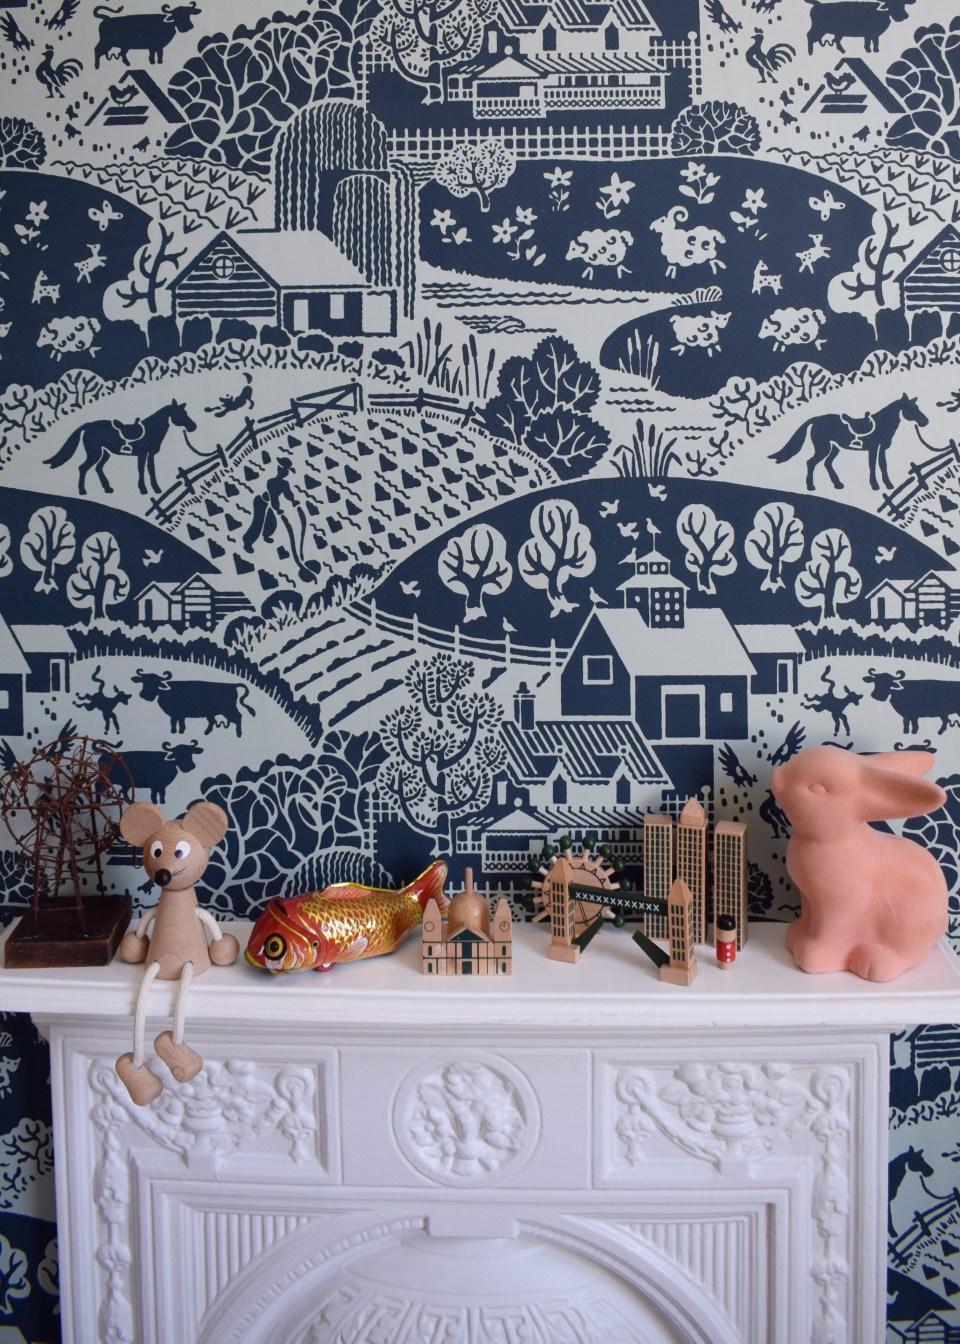 Farrow Ball Gable wallpaper interior ideas, childrens room decor with a scandi monochrome scheme, wooden toys, vintage toys